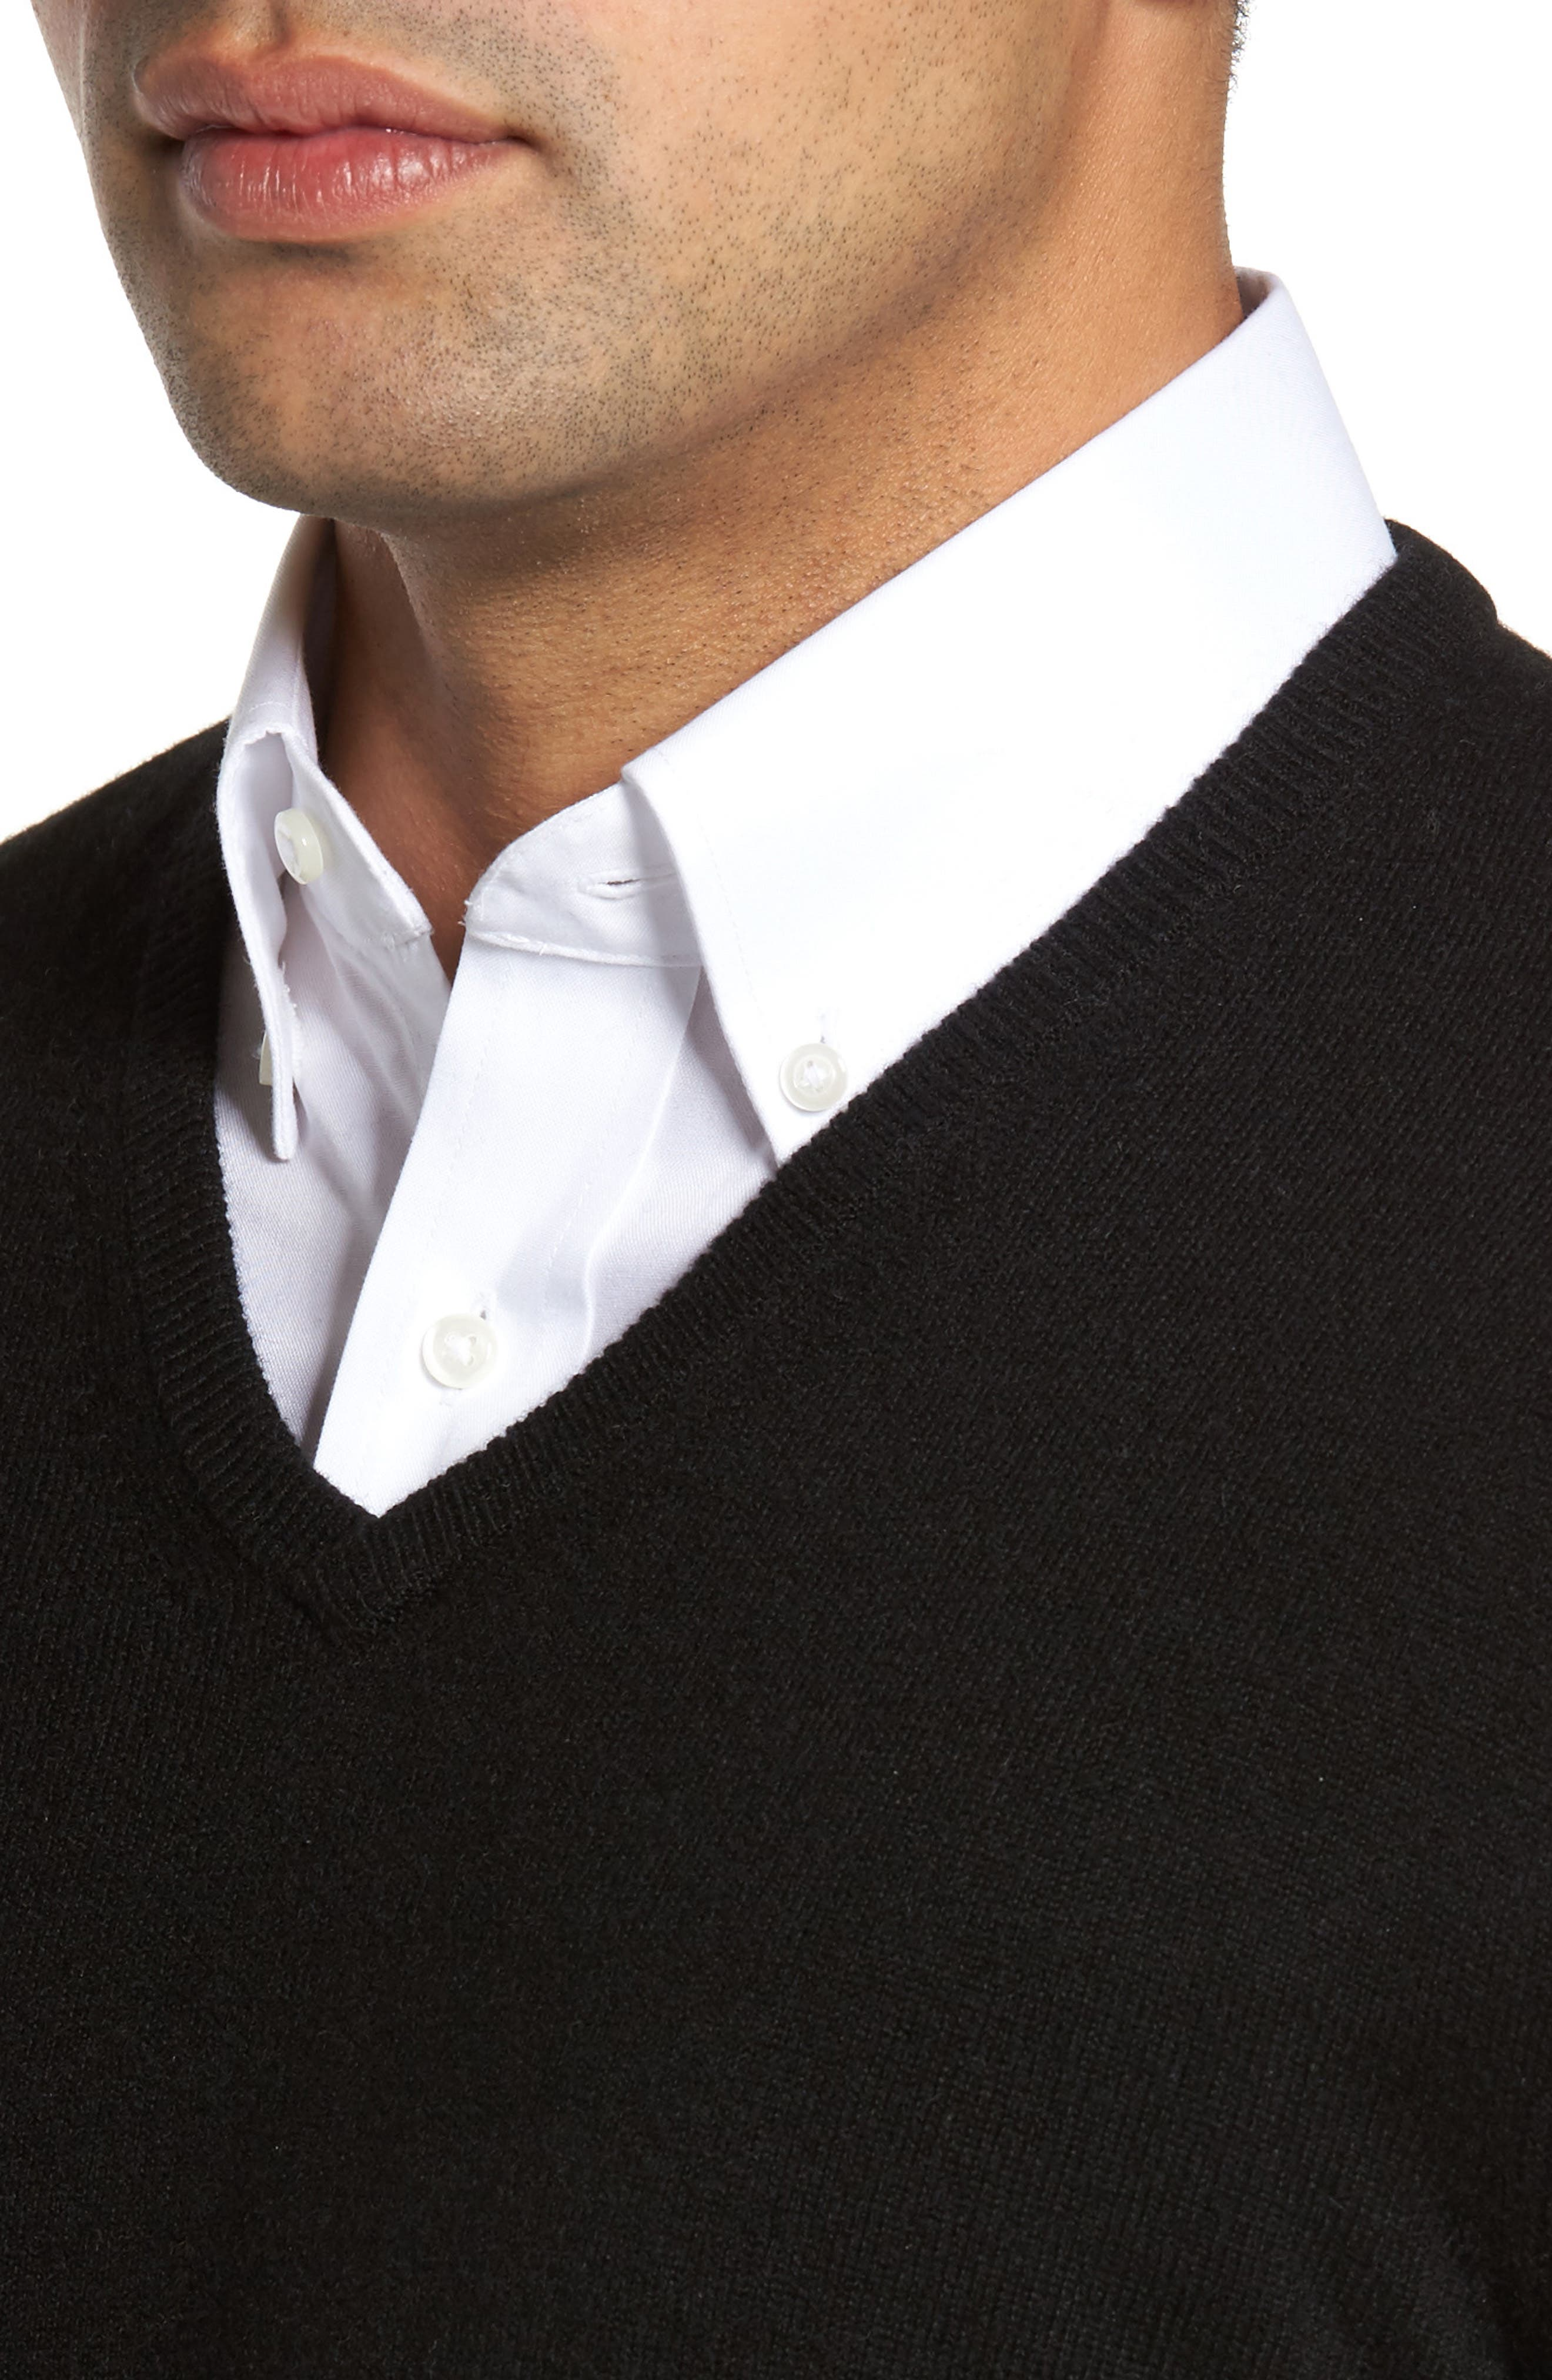 V-Neck Cashmere Sweater,                             Alternate thumbnail 4, color,                             001